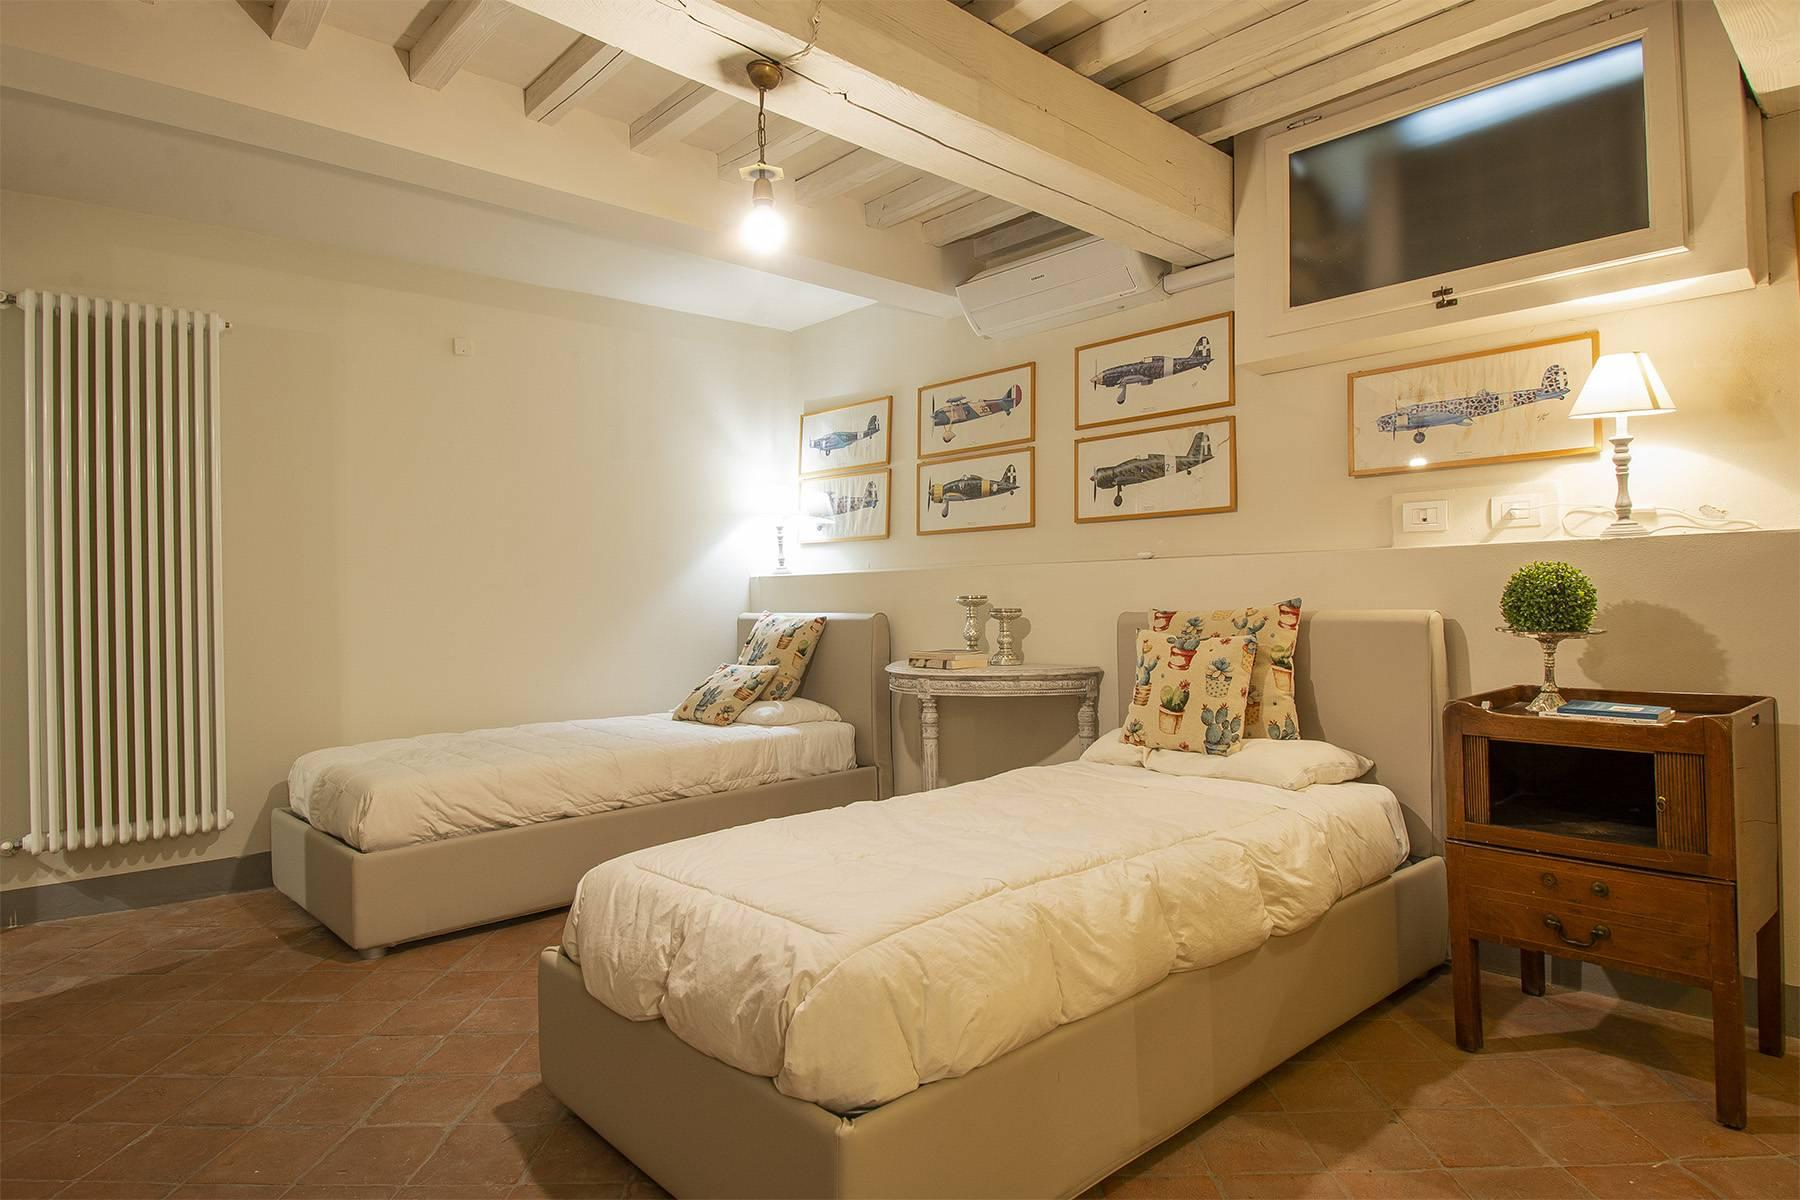 Appartement exclusif au coeur de Lucca - 11